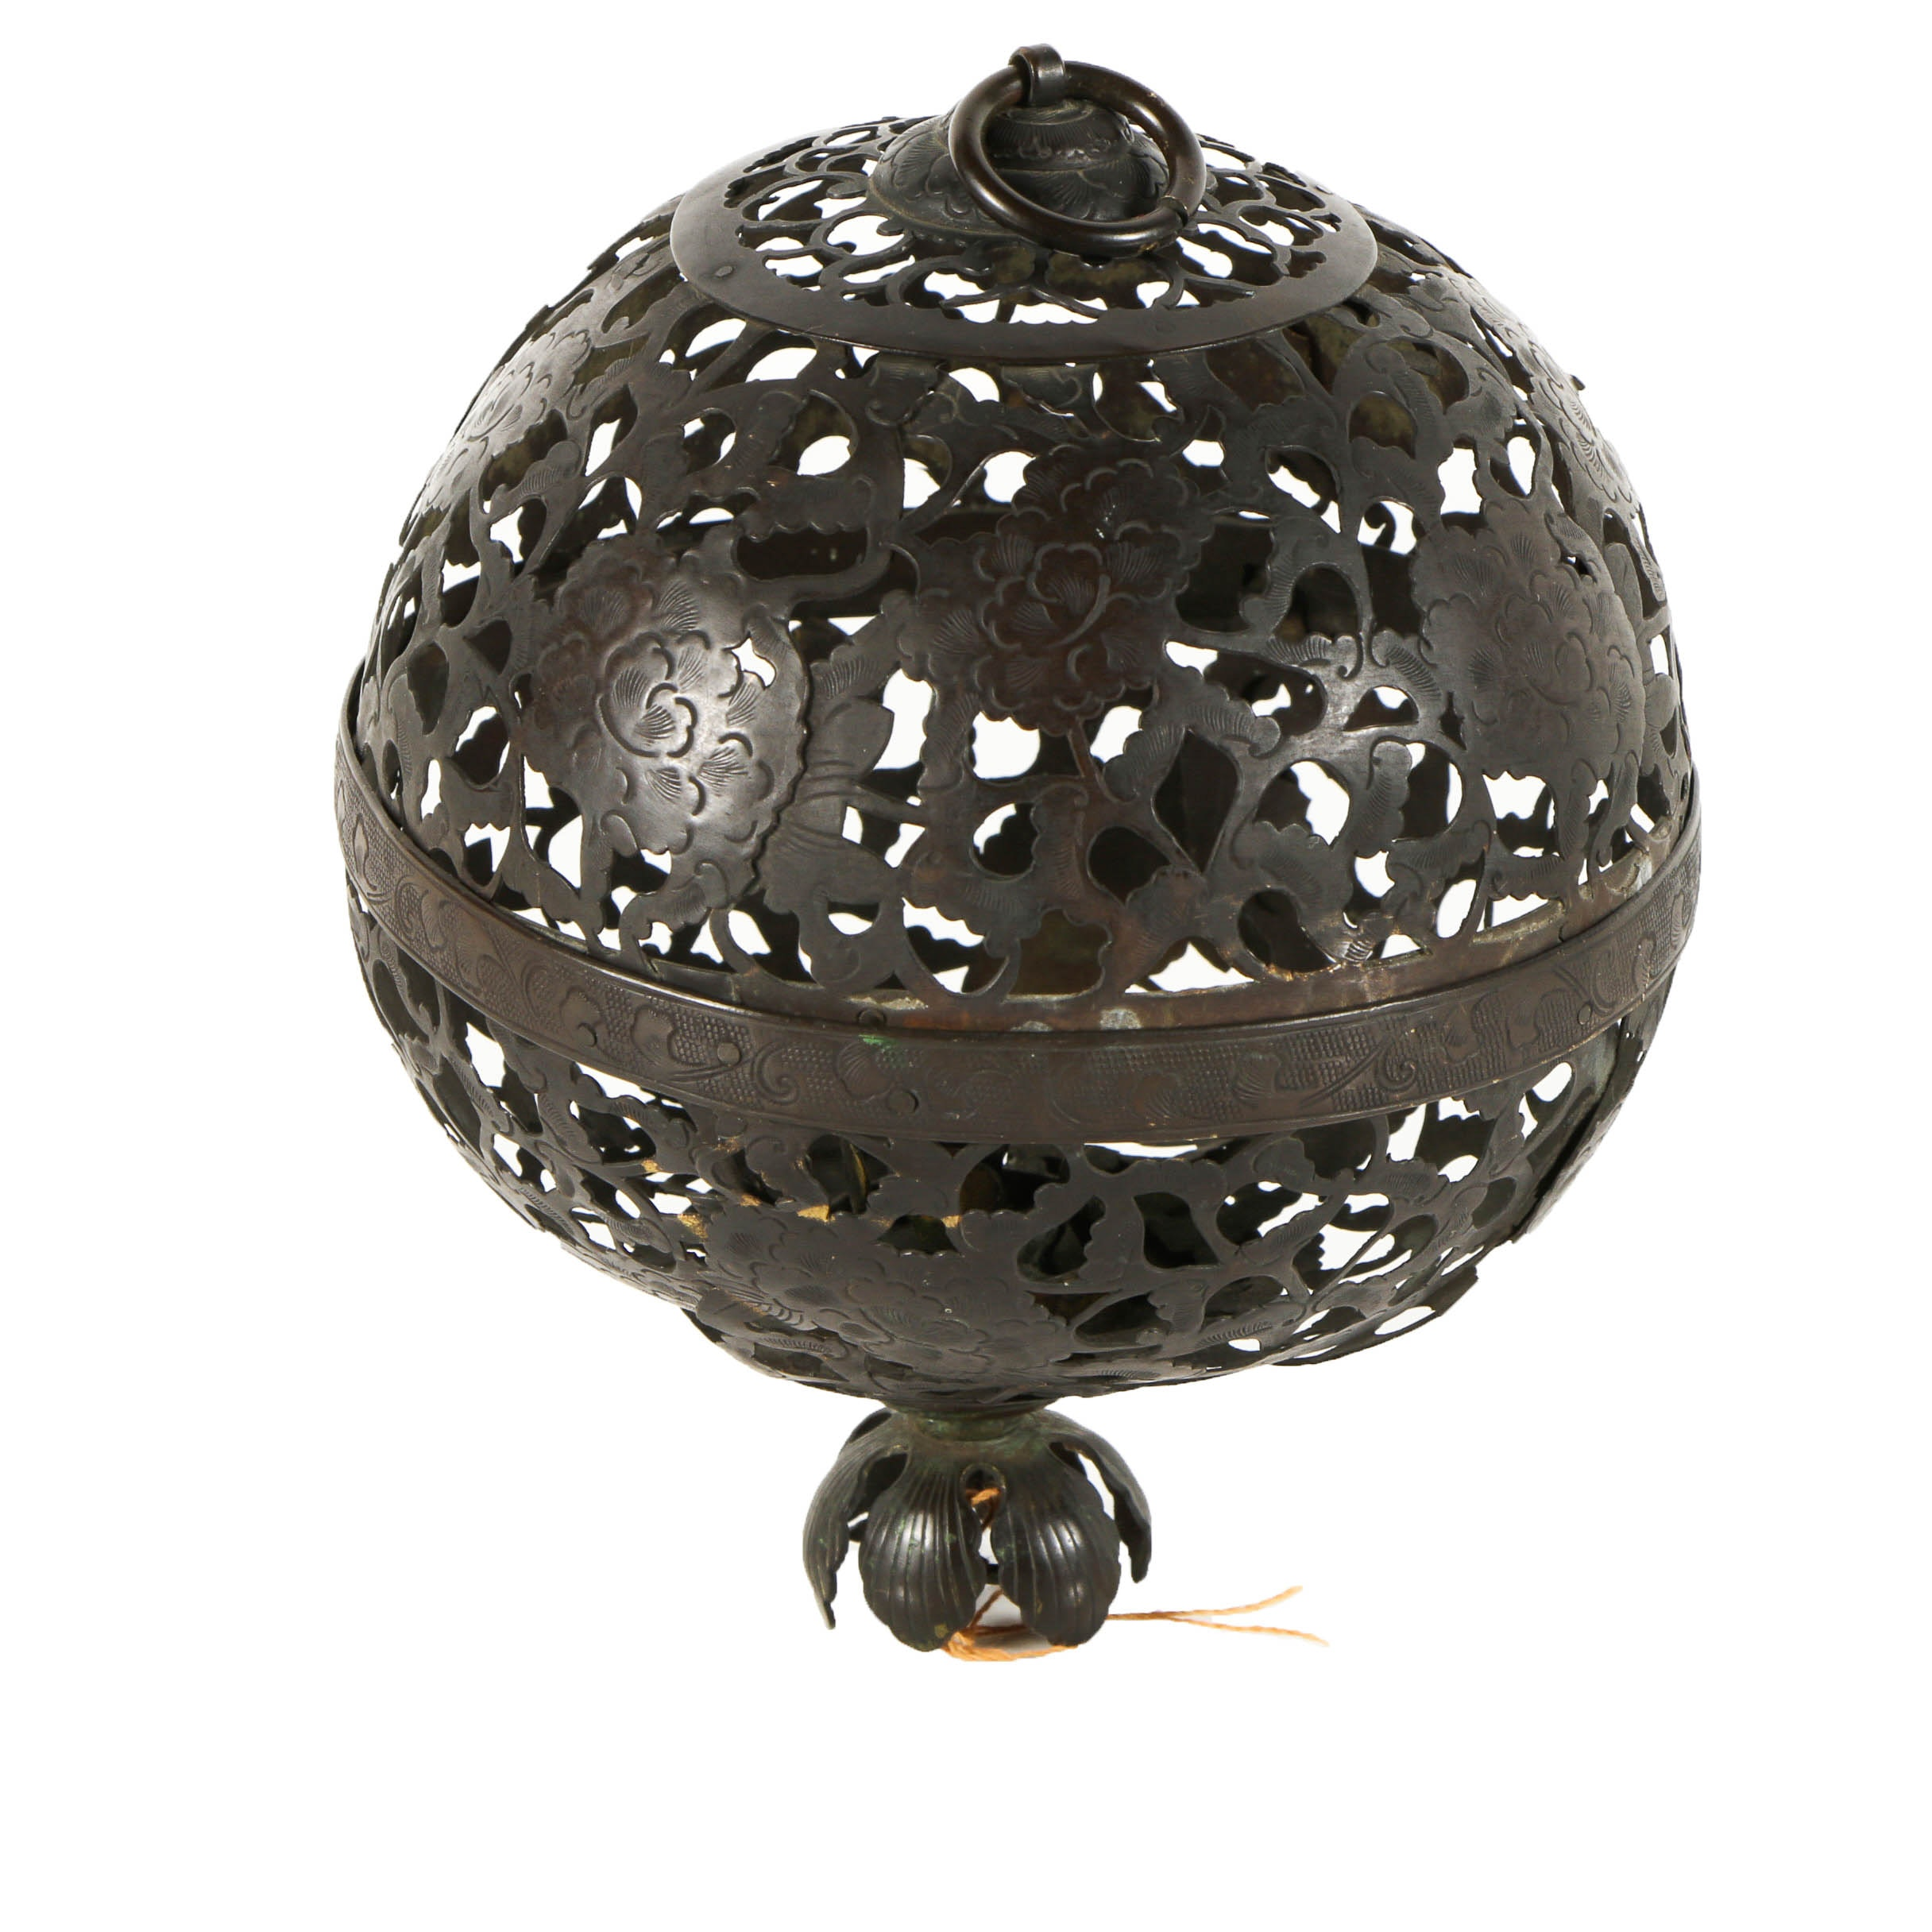 Japanese Pierced Brass Ball with Chrysanthemum Motif